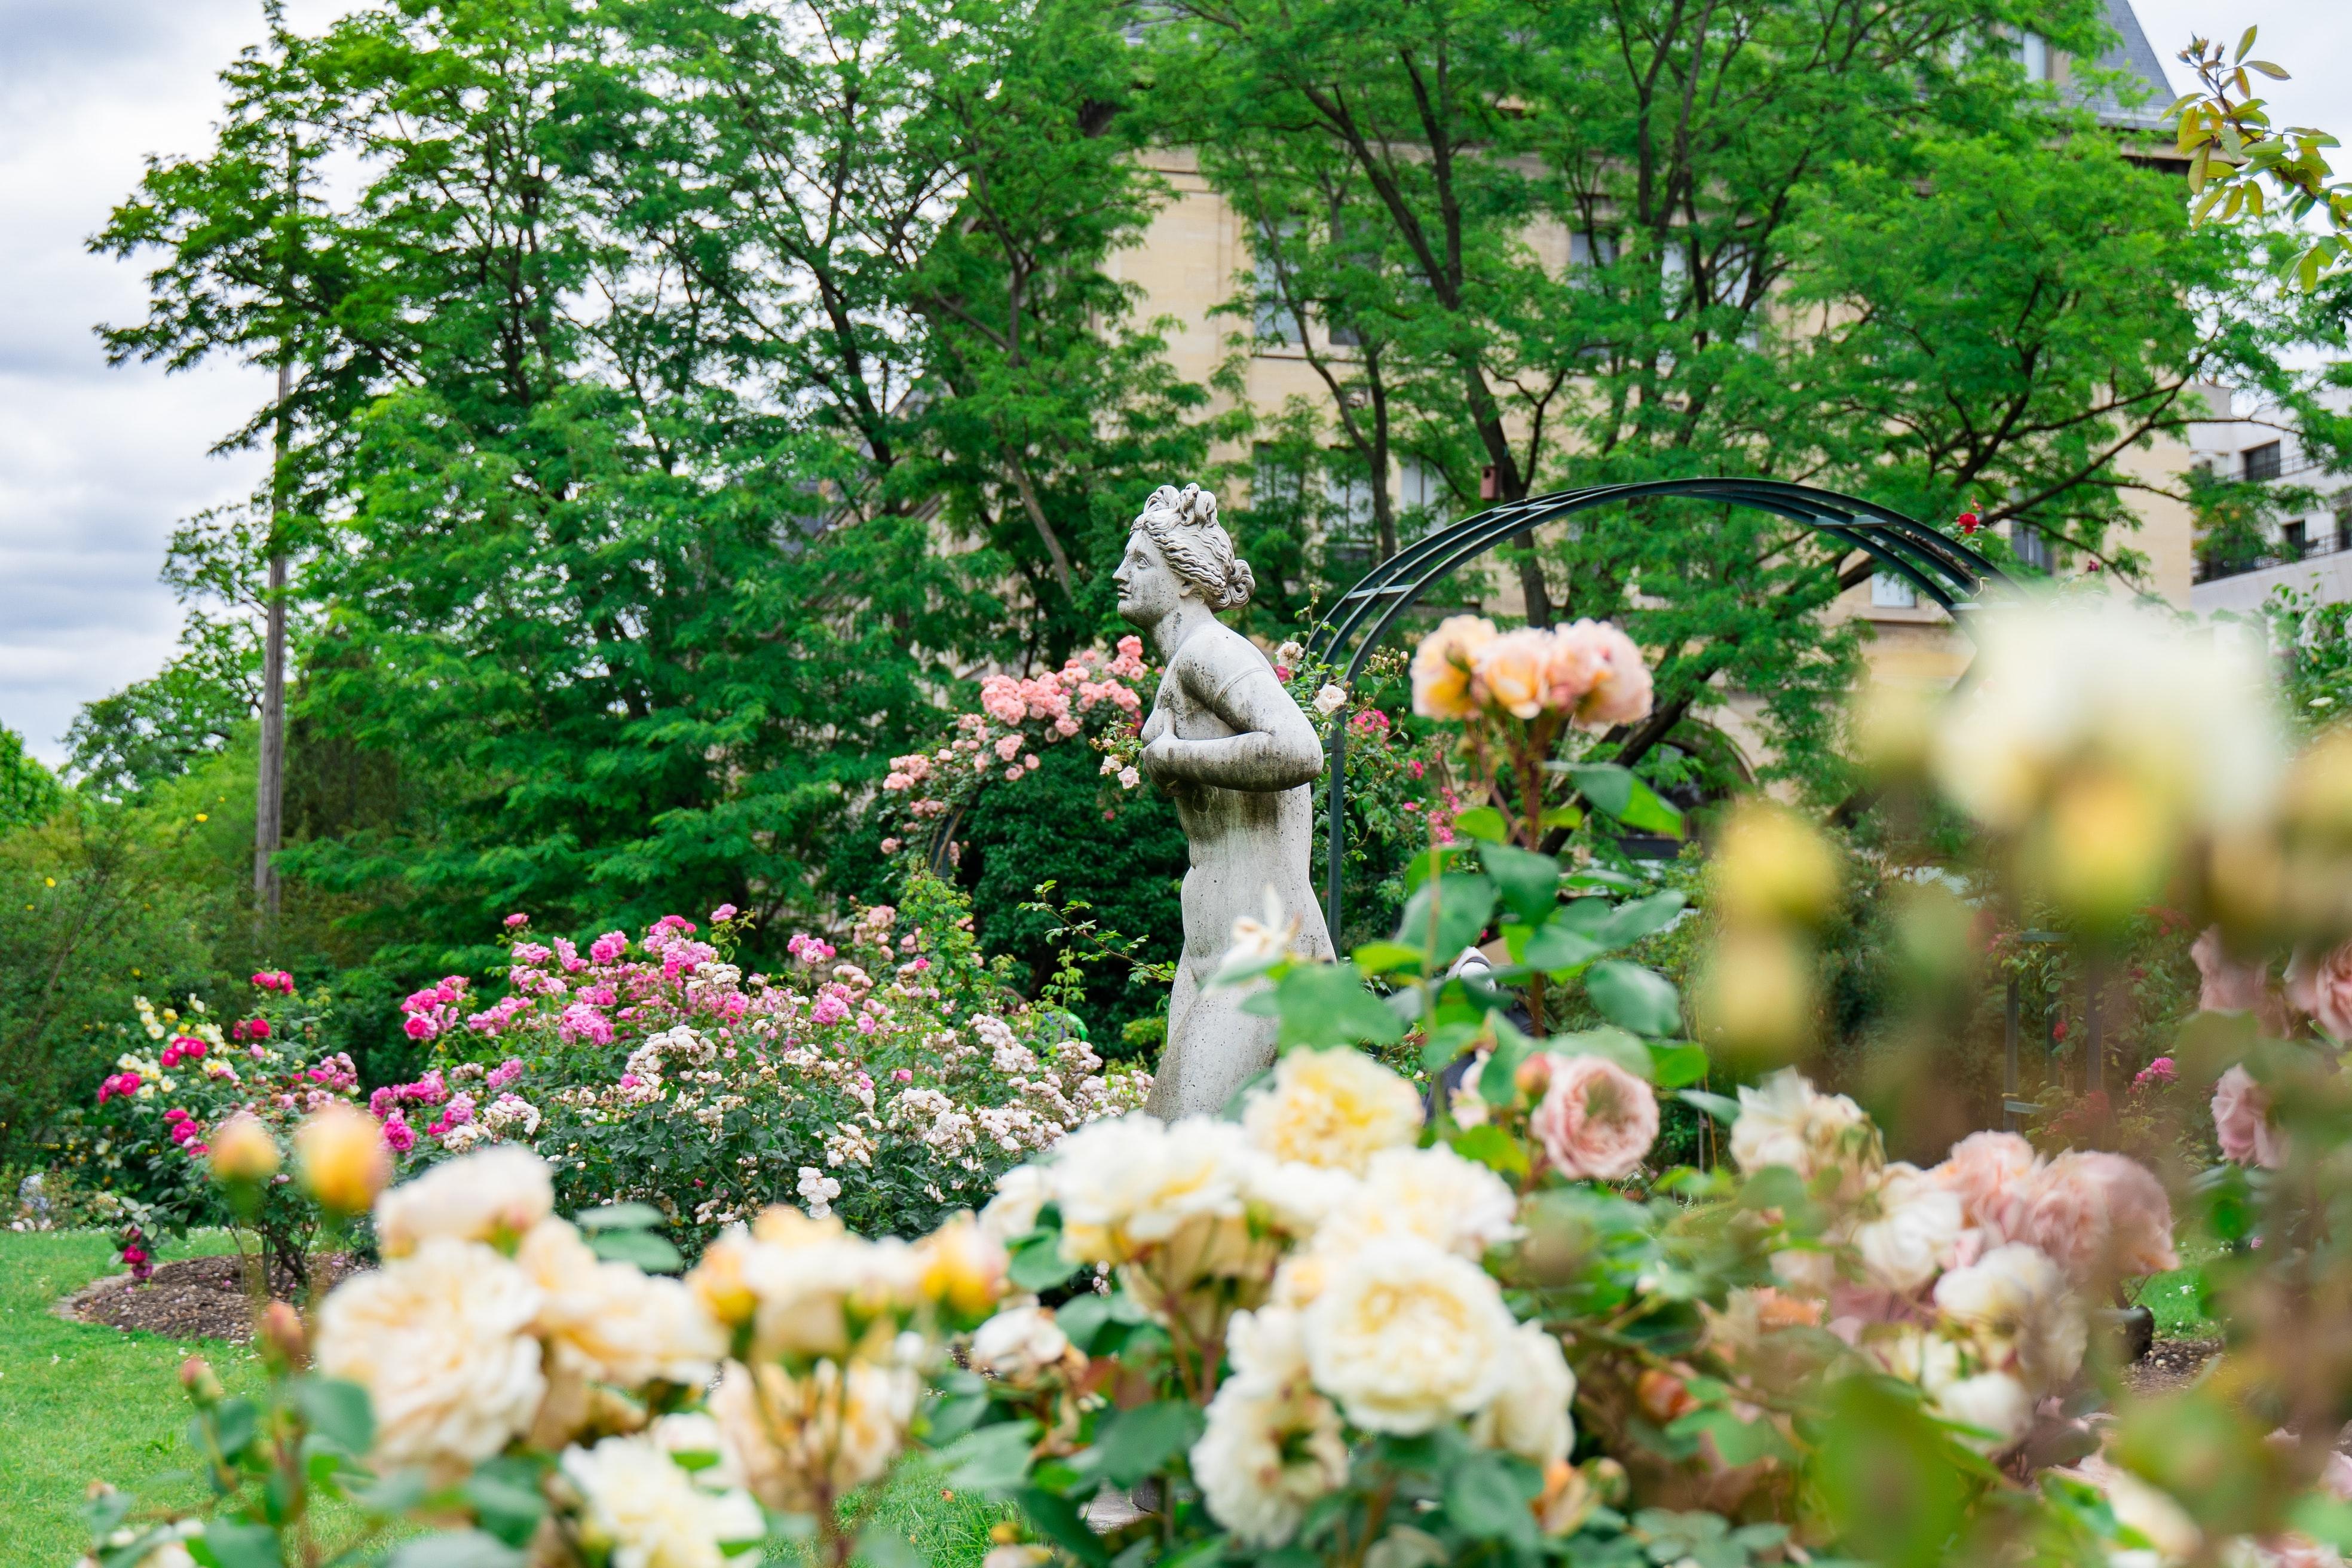 jardin des plantes, most beautiful park in France